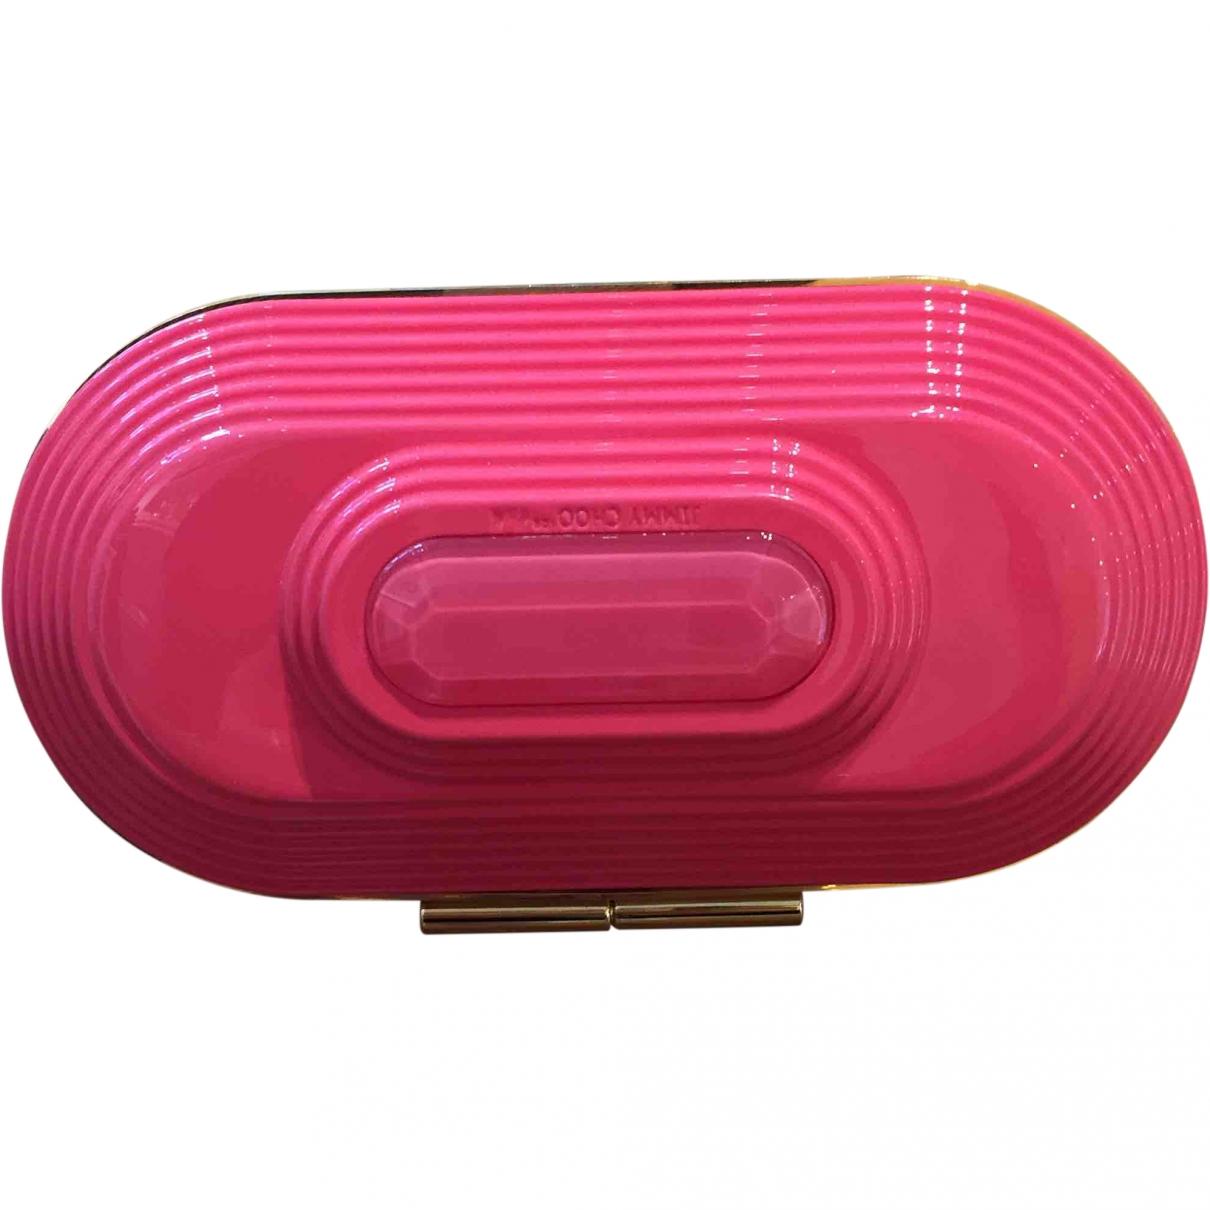 Jimmy Choo For H&m \N Pink Clutch bag for Women \N